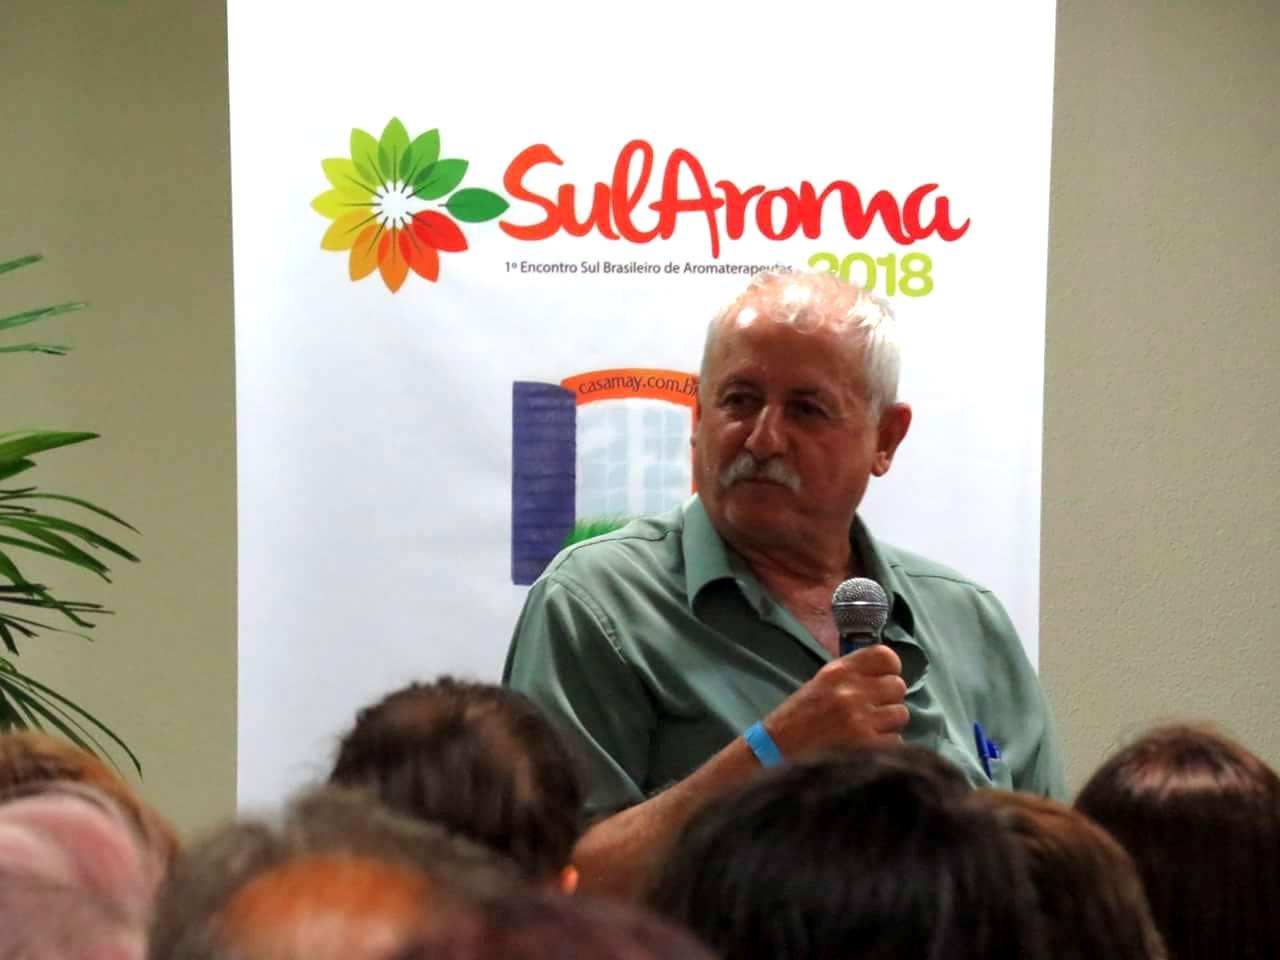 SulAroma - Encontro Sul Brasileiro de Aromaterapeutas - Óleos Essenciais